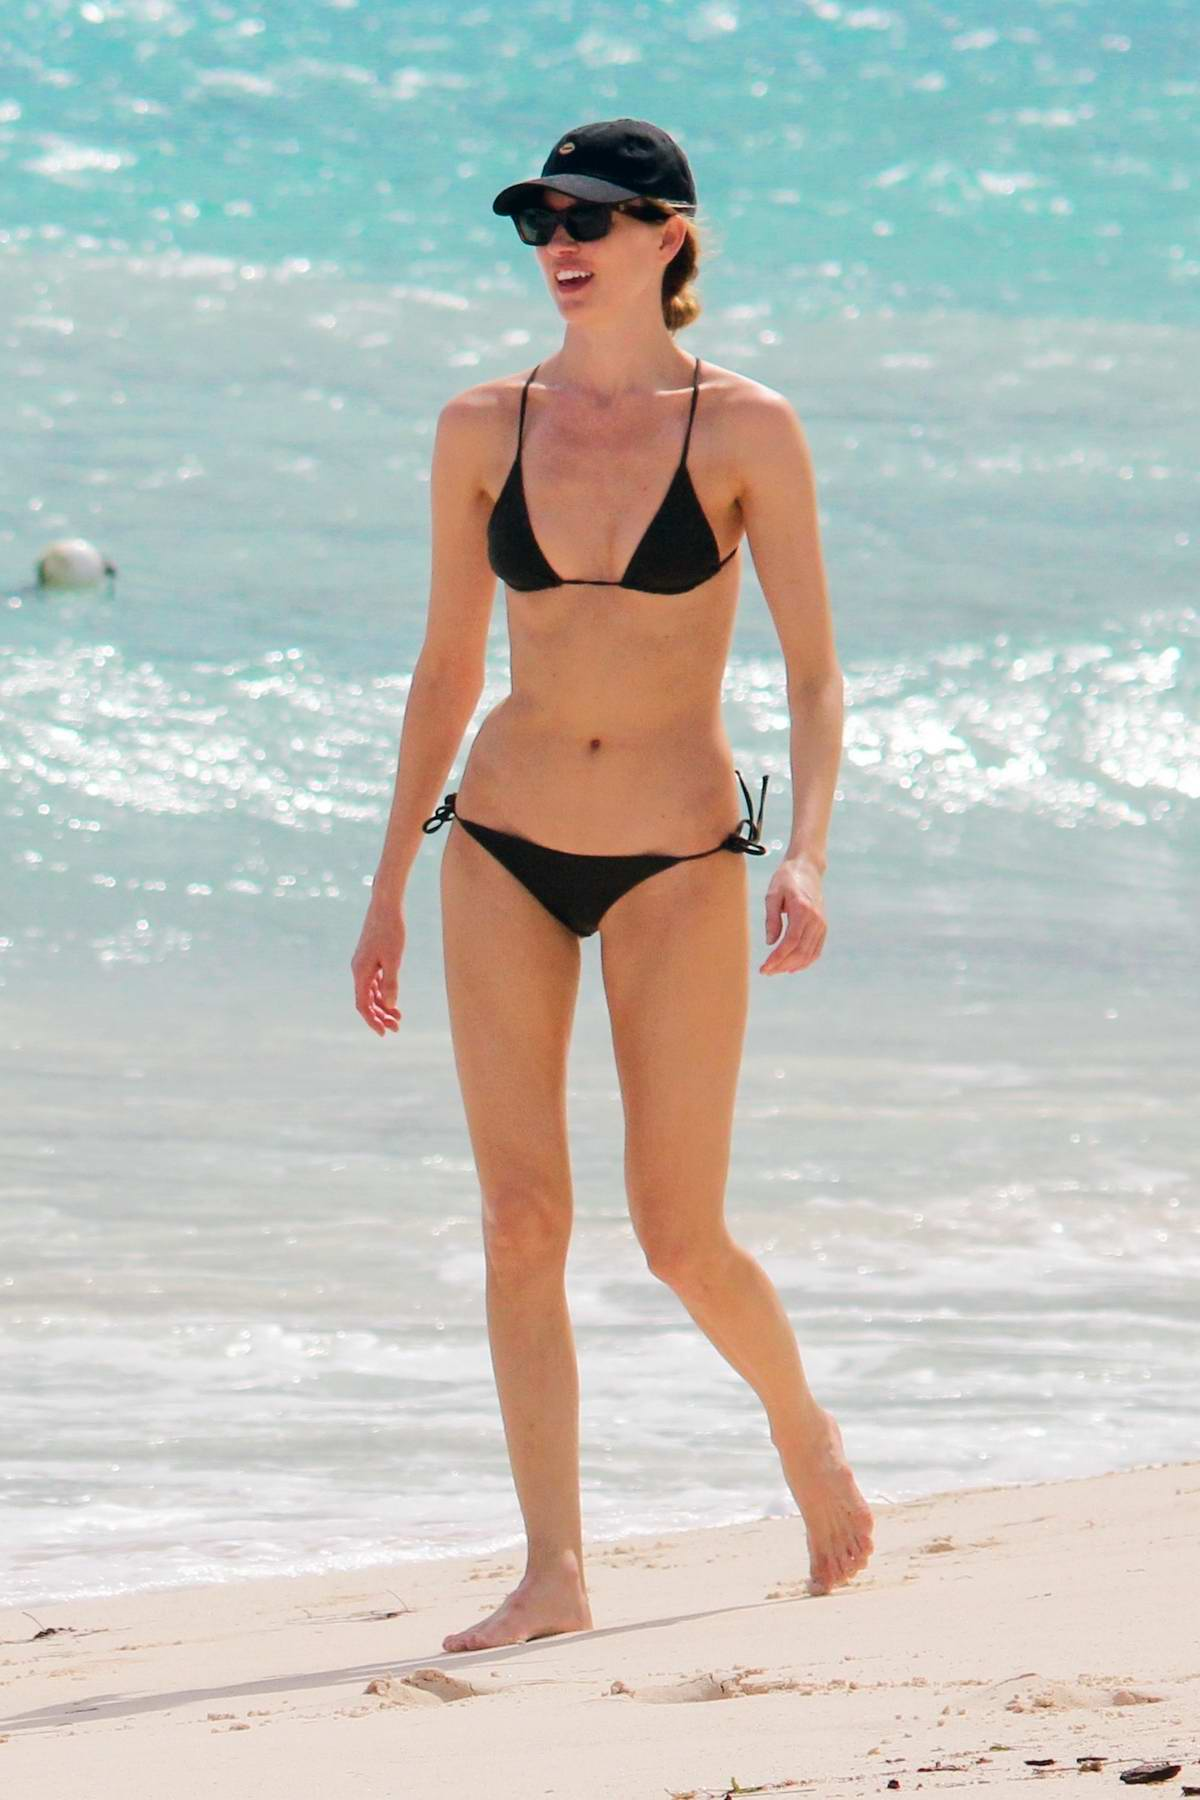 Martha Hunt stuns in a black bikini while enjoying a stroll through the beach with fiancé Jason McDonald in Tulum, Mexico